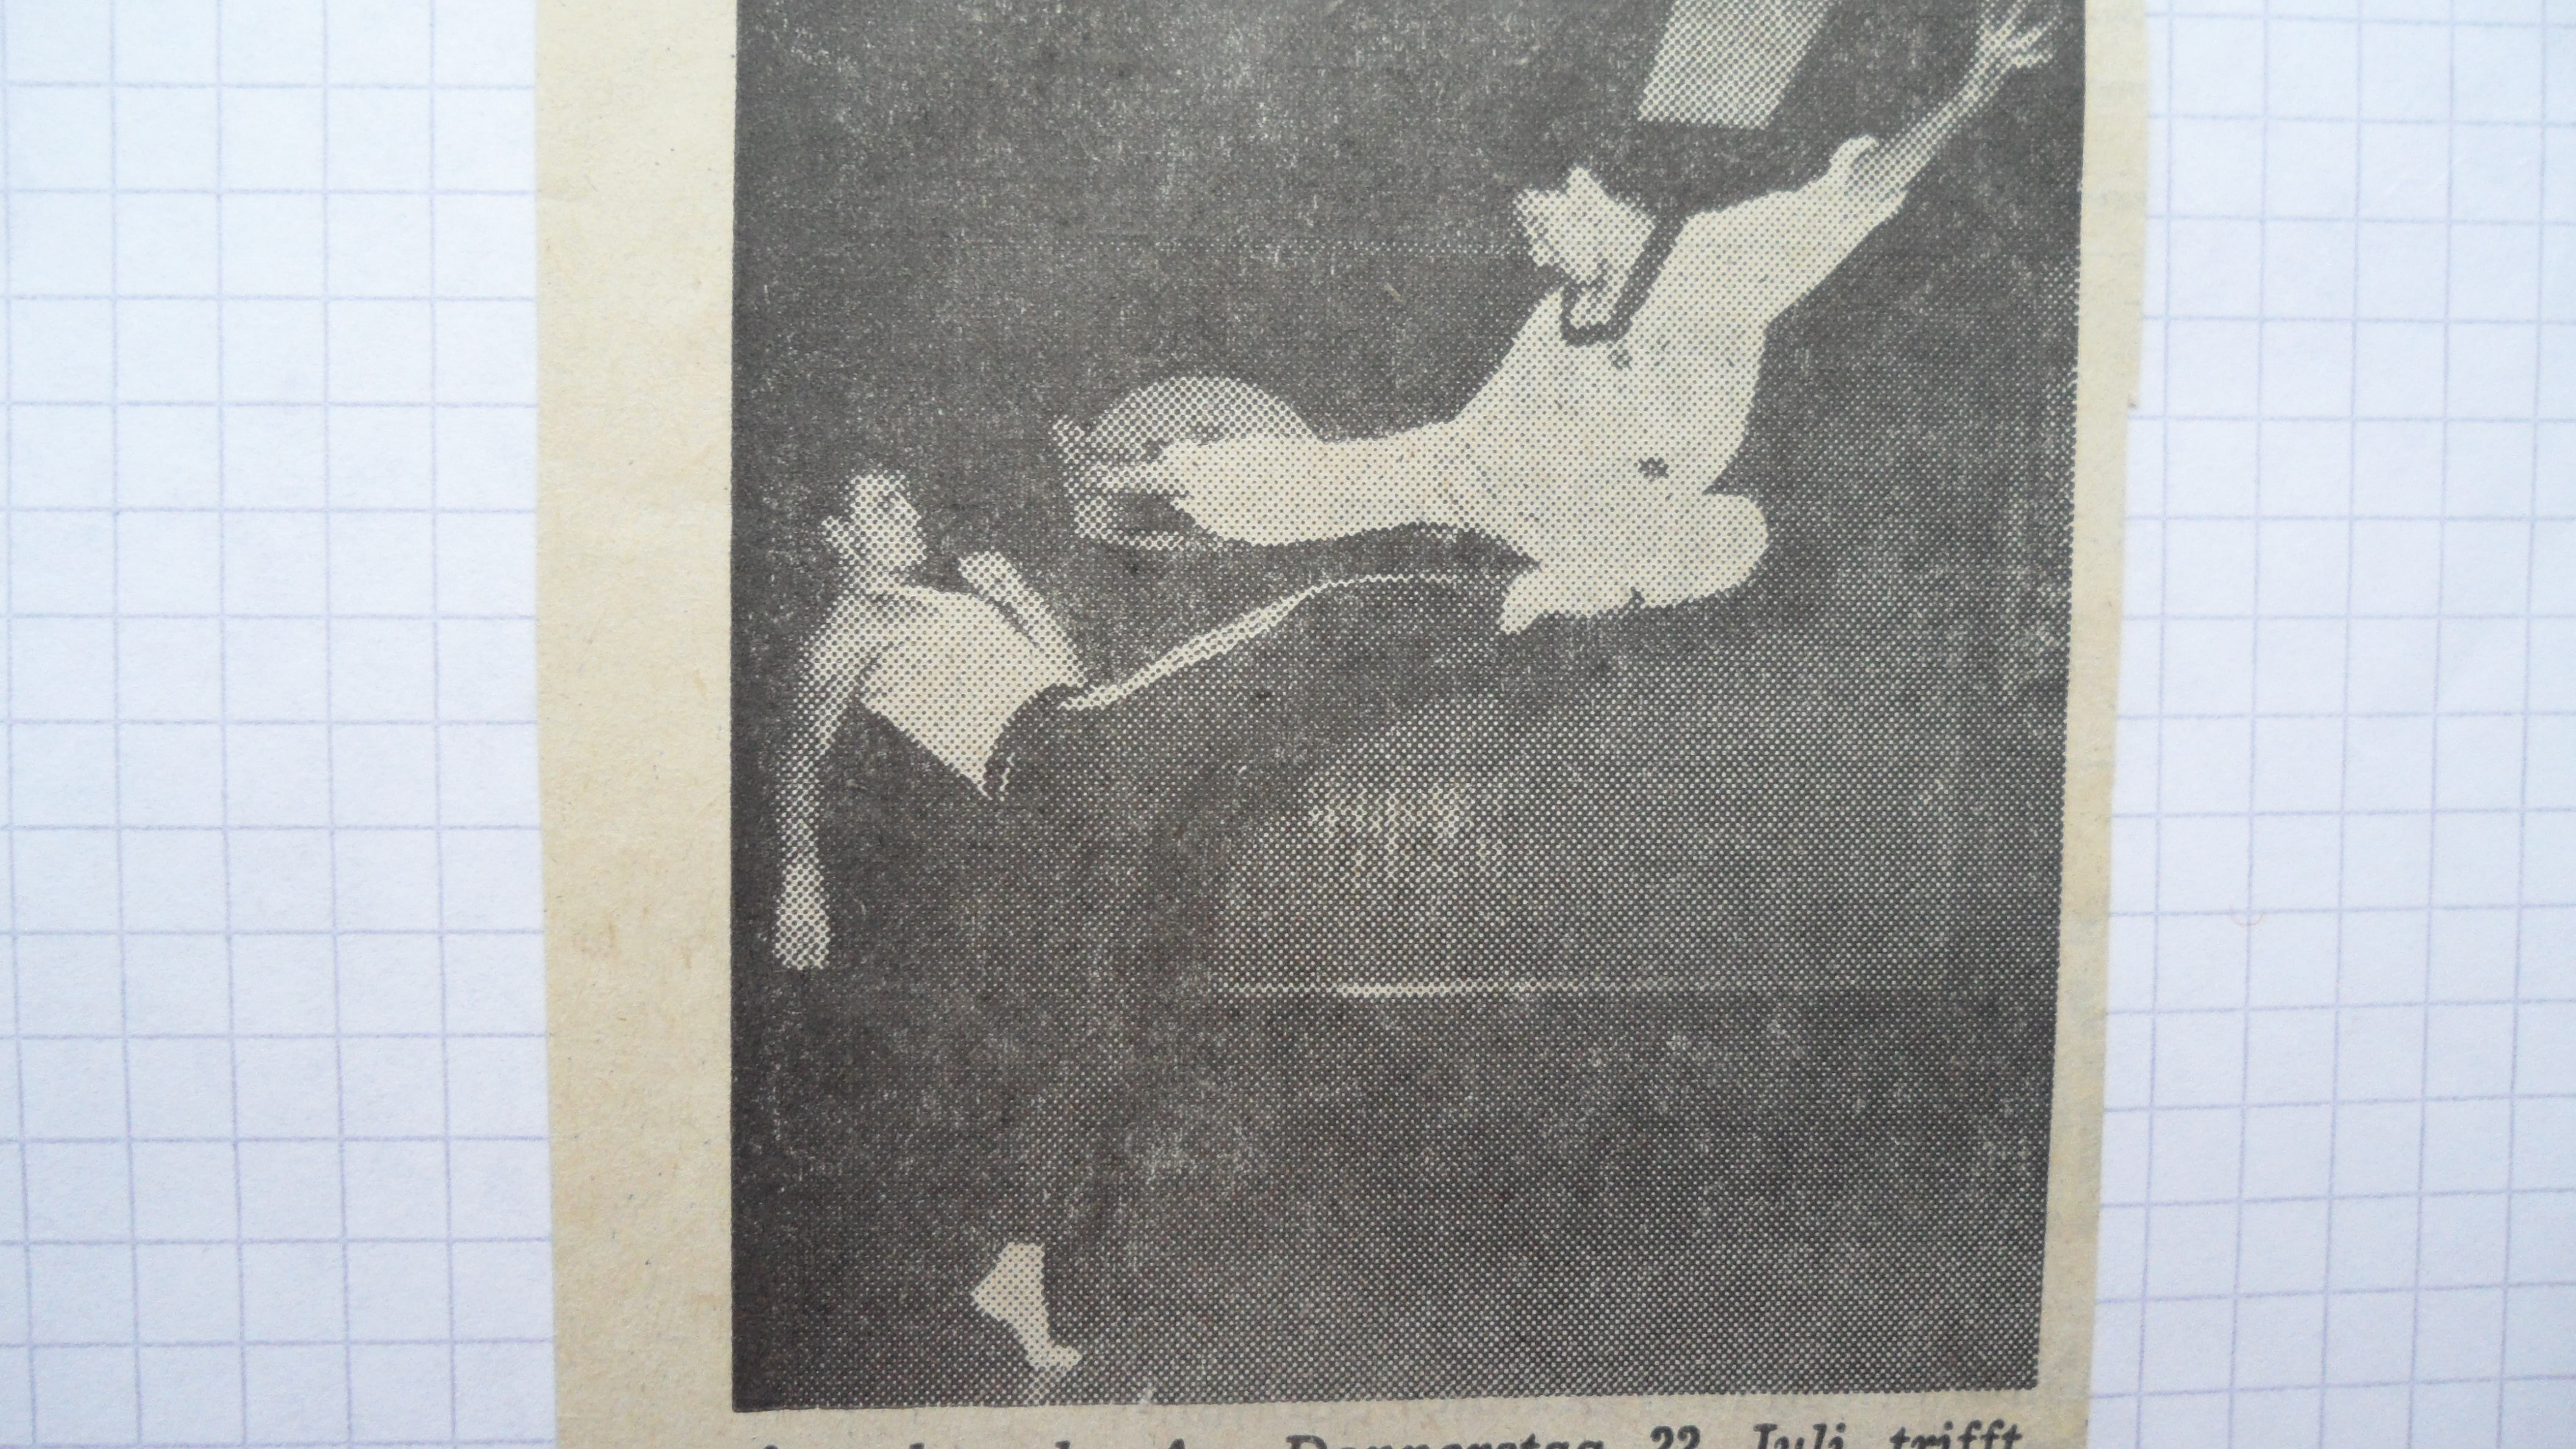 Taekwondo Ansbach Kampfsport Herbst 4